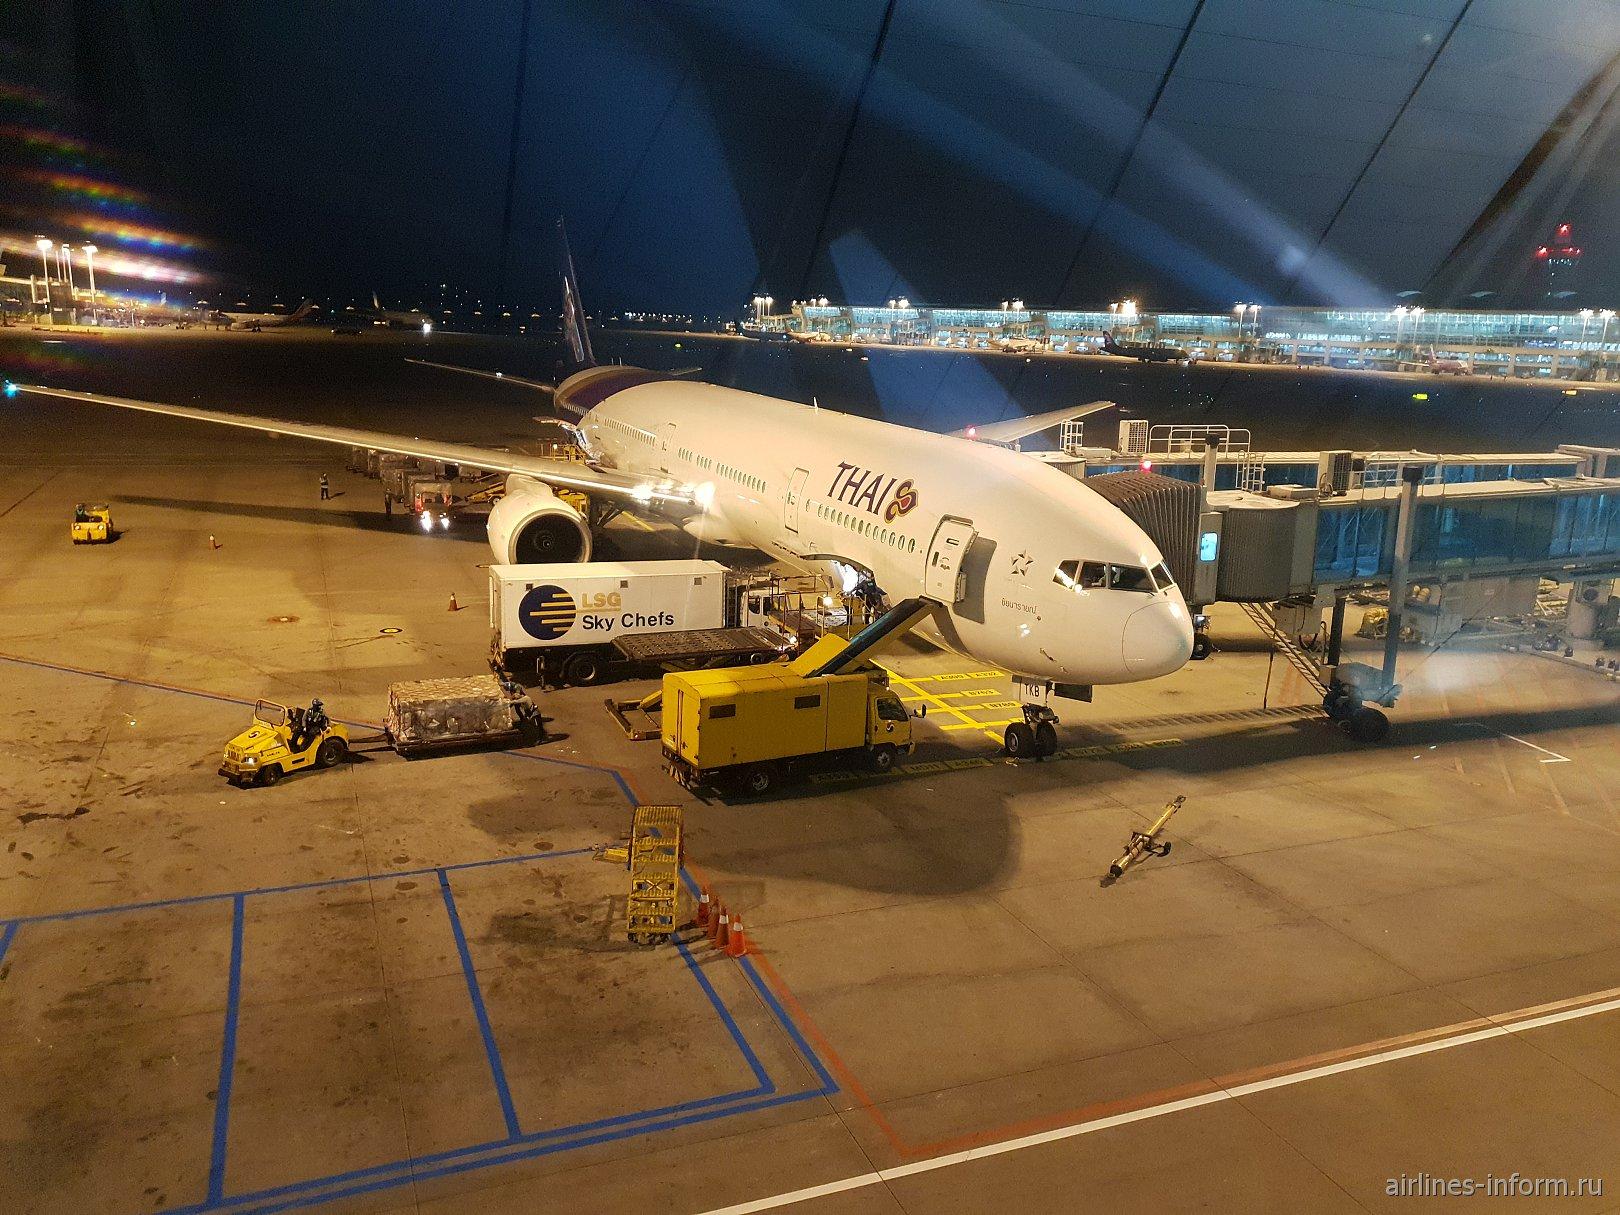 Майские каникулы ч.1 Южно-Сахалинск (USS) - Сеул (ICN) - Бангкок (BKK). Asiana Airlines (эконом) А321-200 / Thai Airways (бизнес) Boeing 777-300